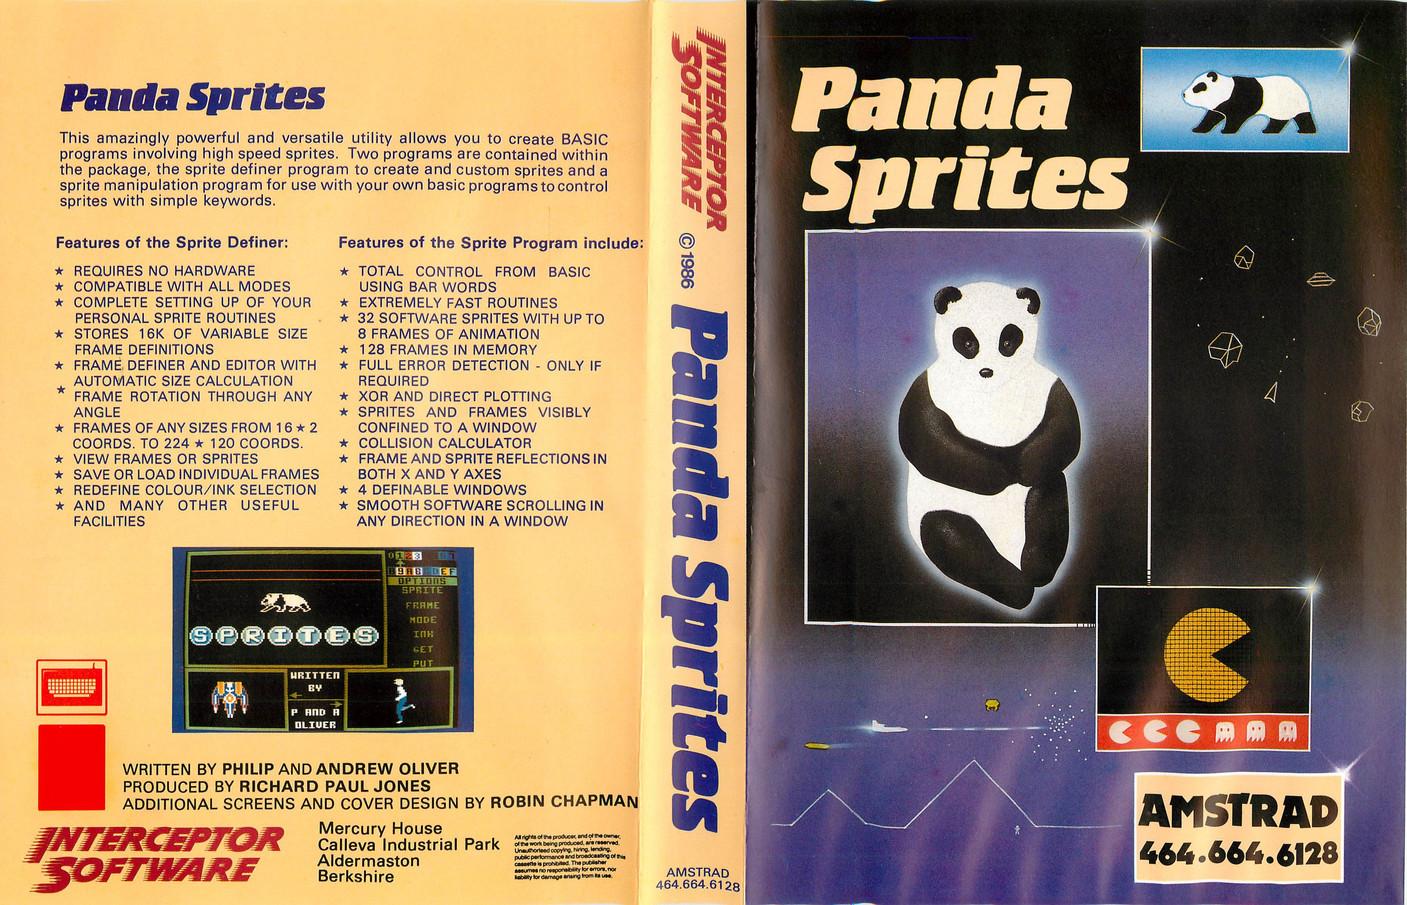 PandaSpritesCover.jpg